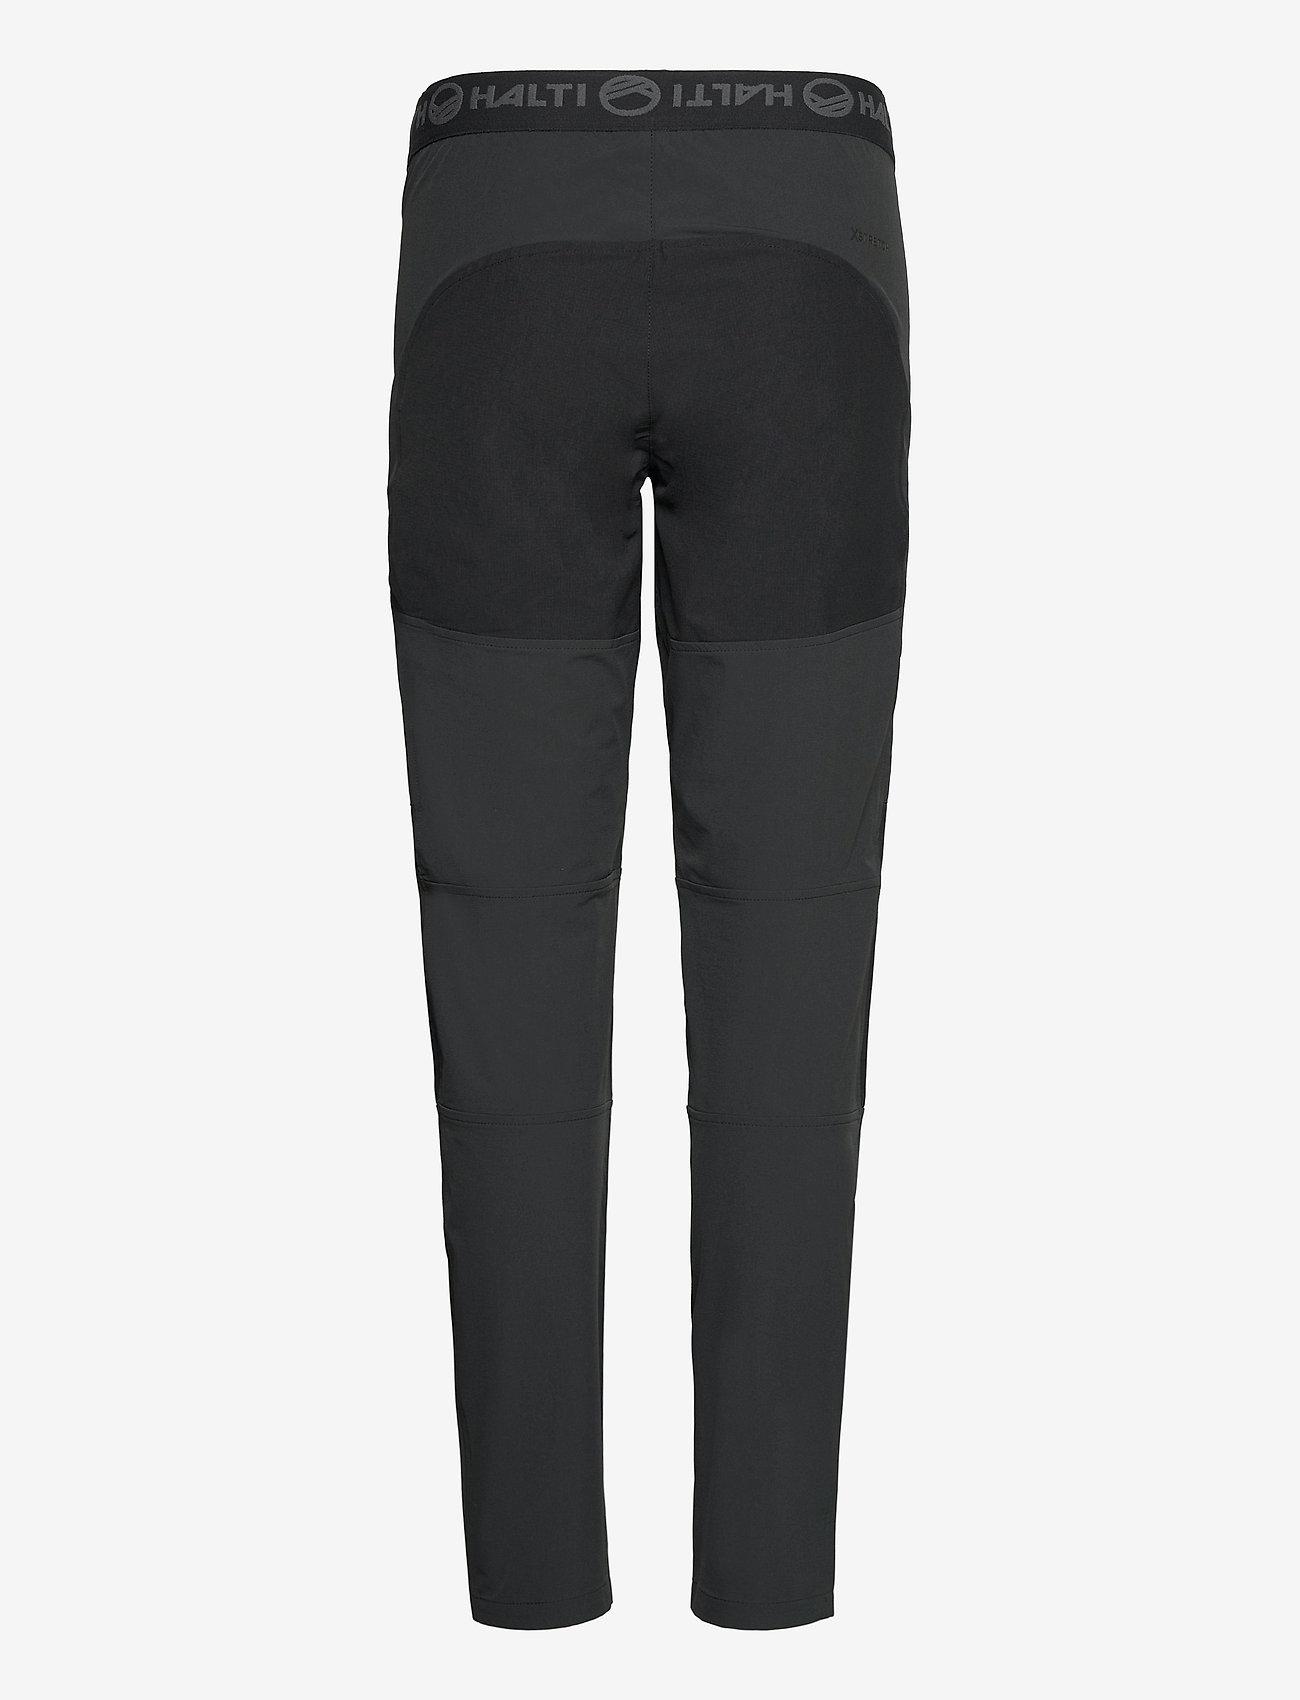 Halti - Pallas II Women's X-stretch Pants - friluftsbukser - anthracite grey - 1